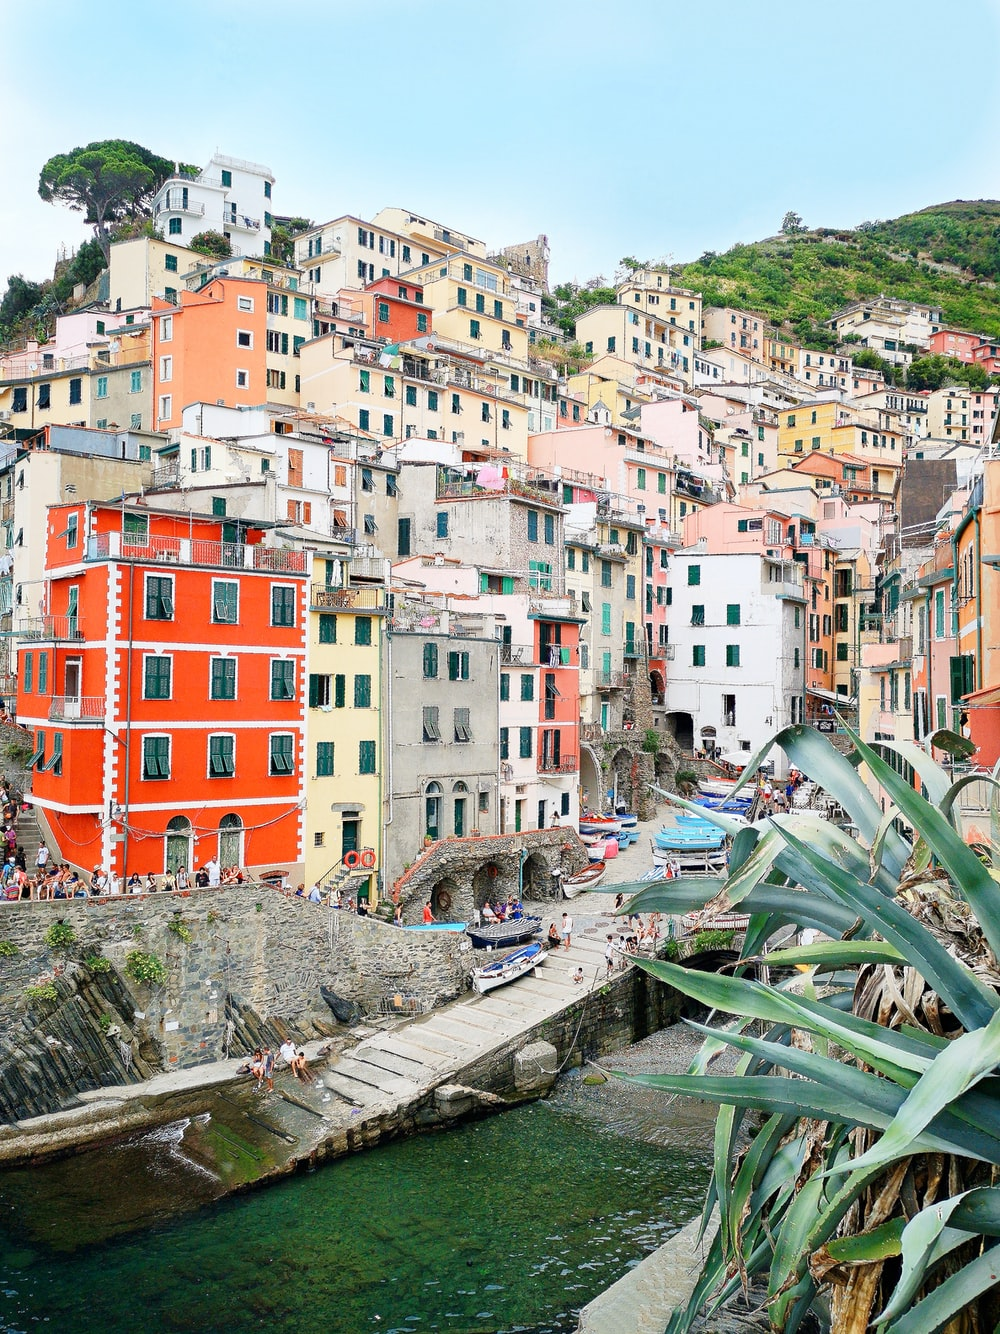 multicolored buildings near body of water